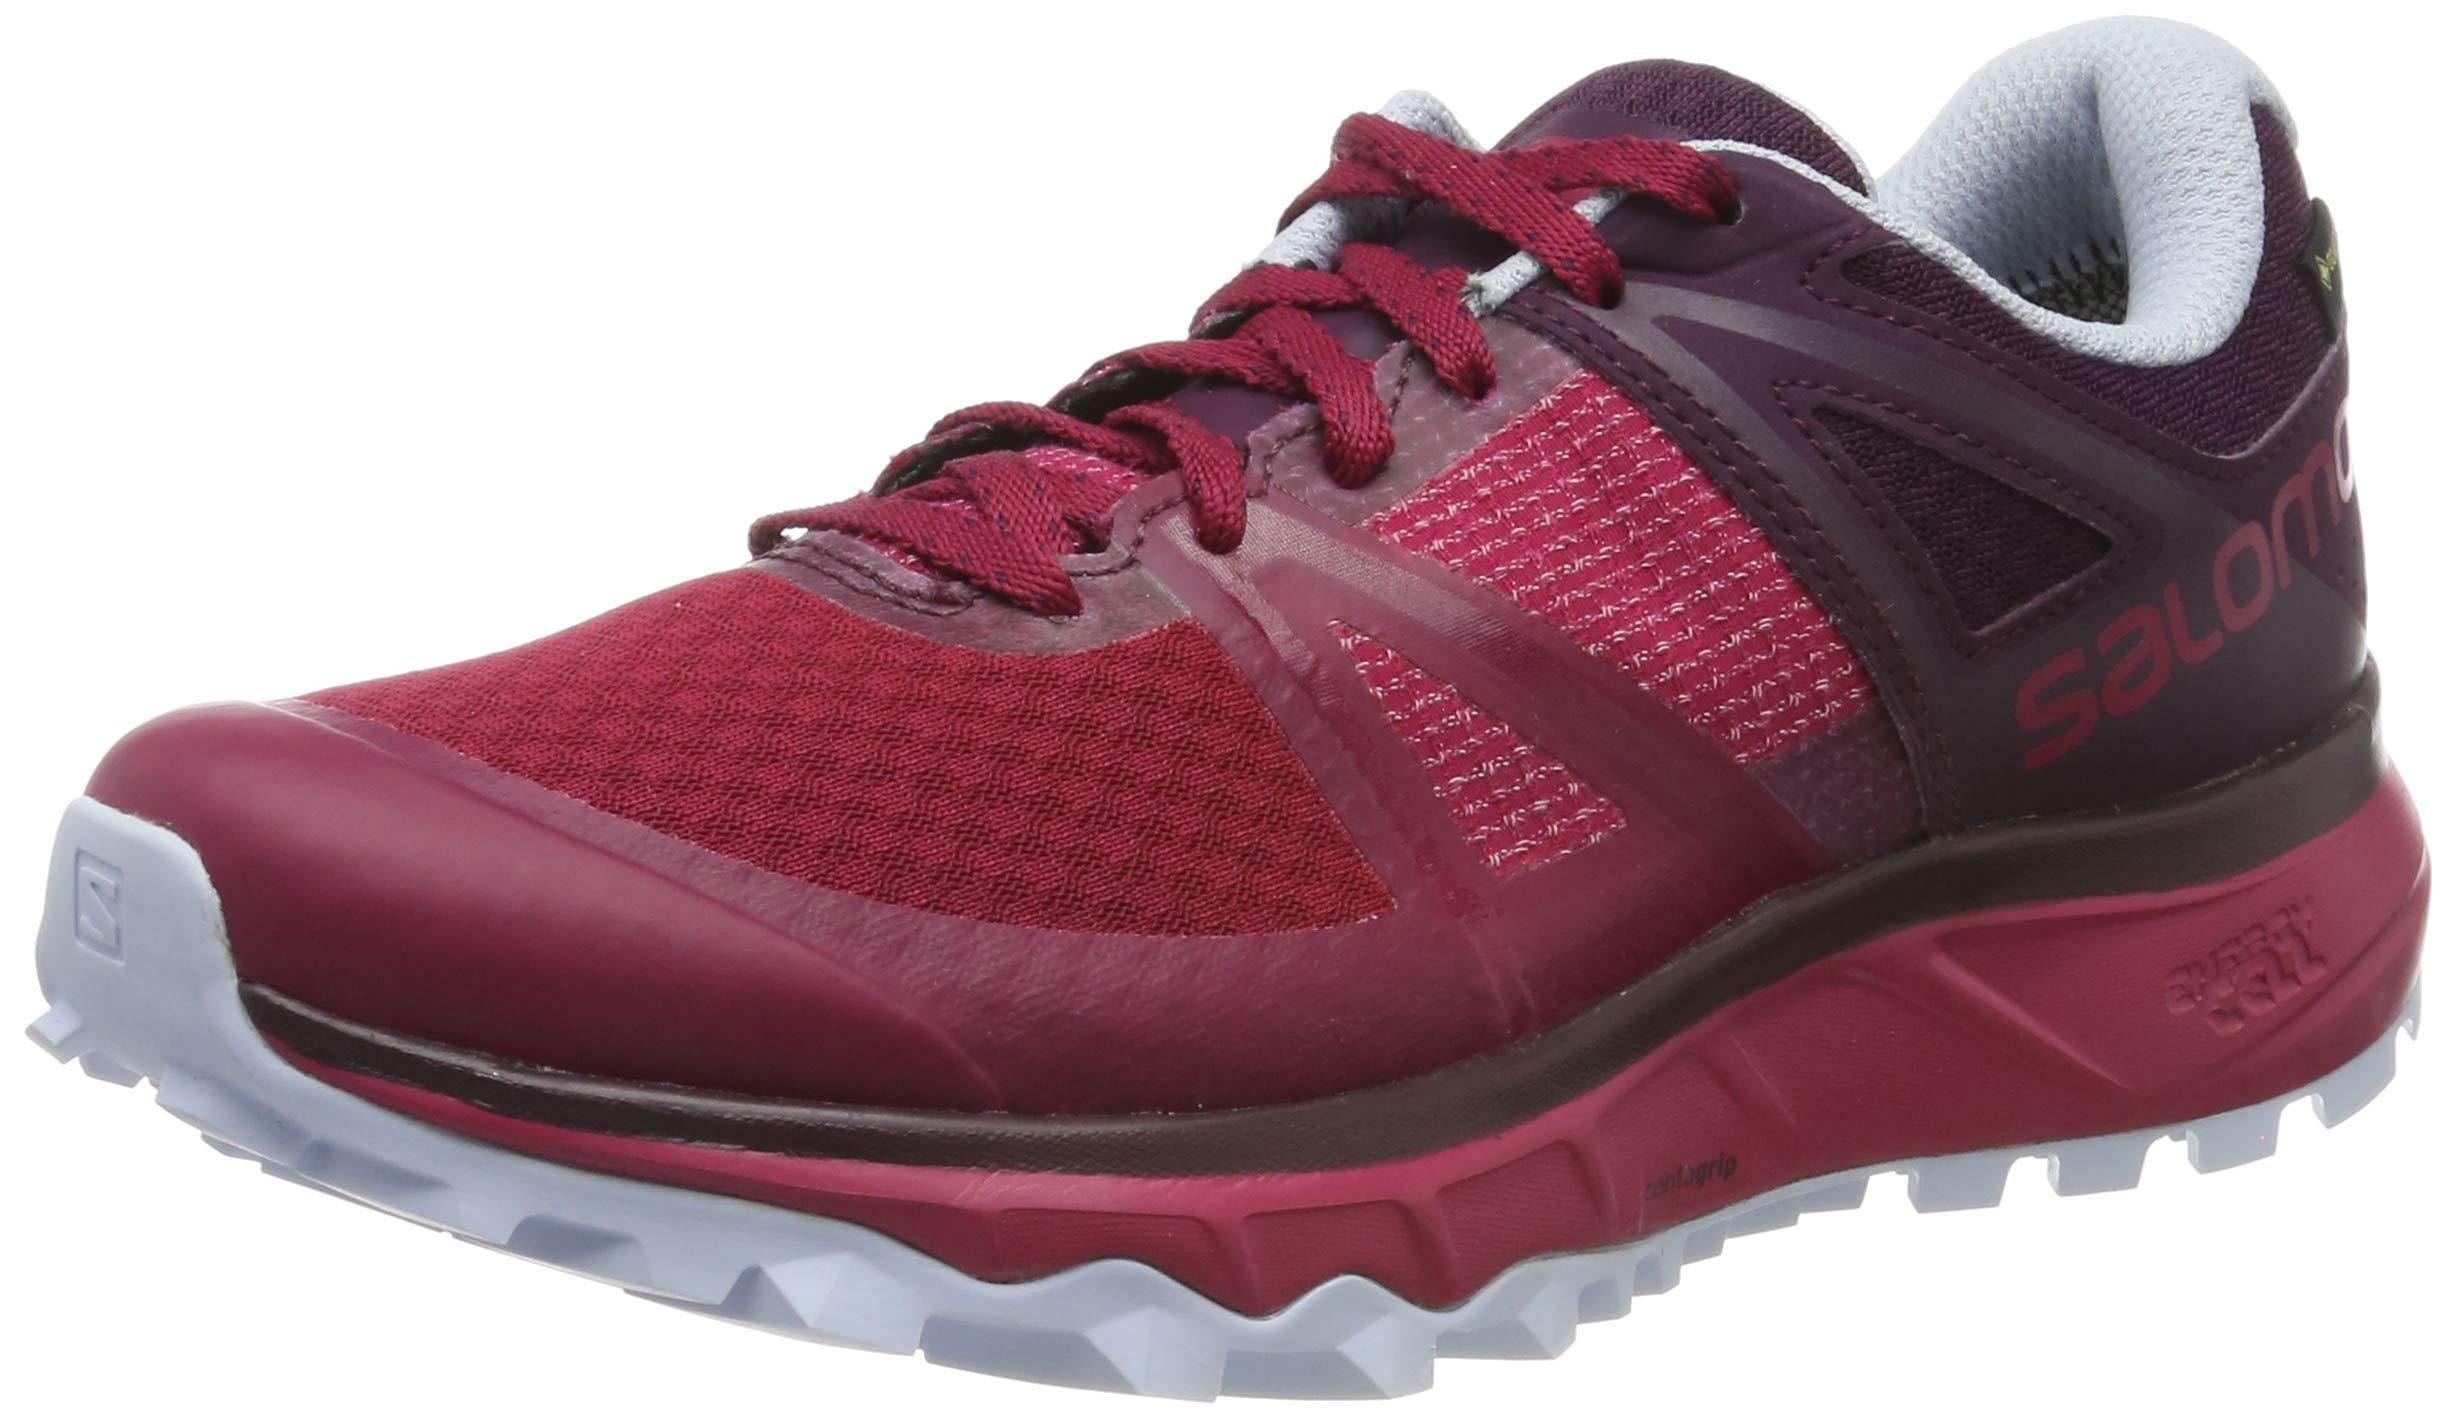 Gtx potent Chaussures 2 Femme Purple heatherPointure36 Salomon 3 WRosecerise RunningTrailster De Trail fYb6gy7